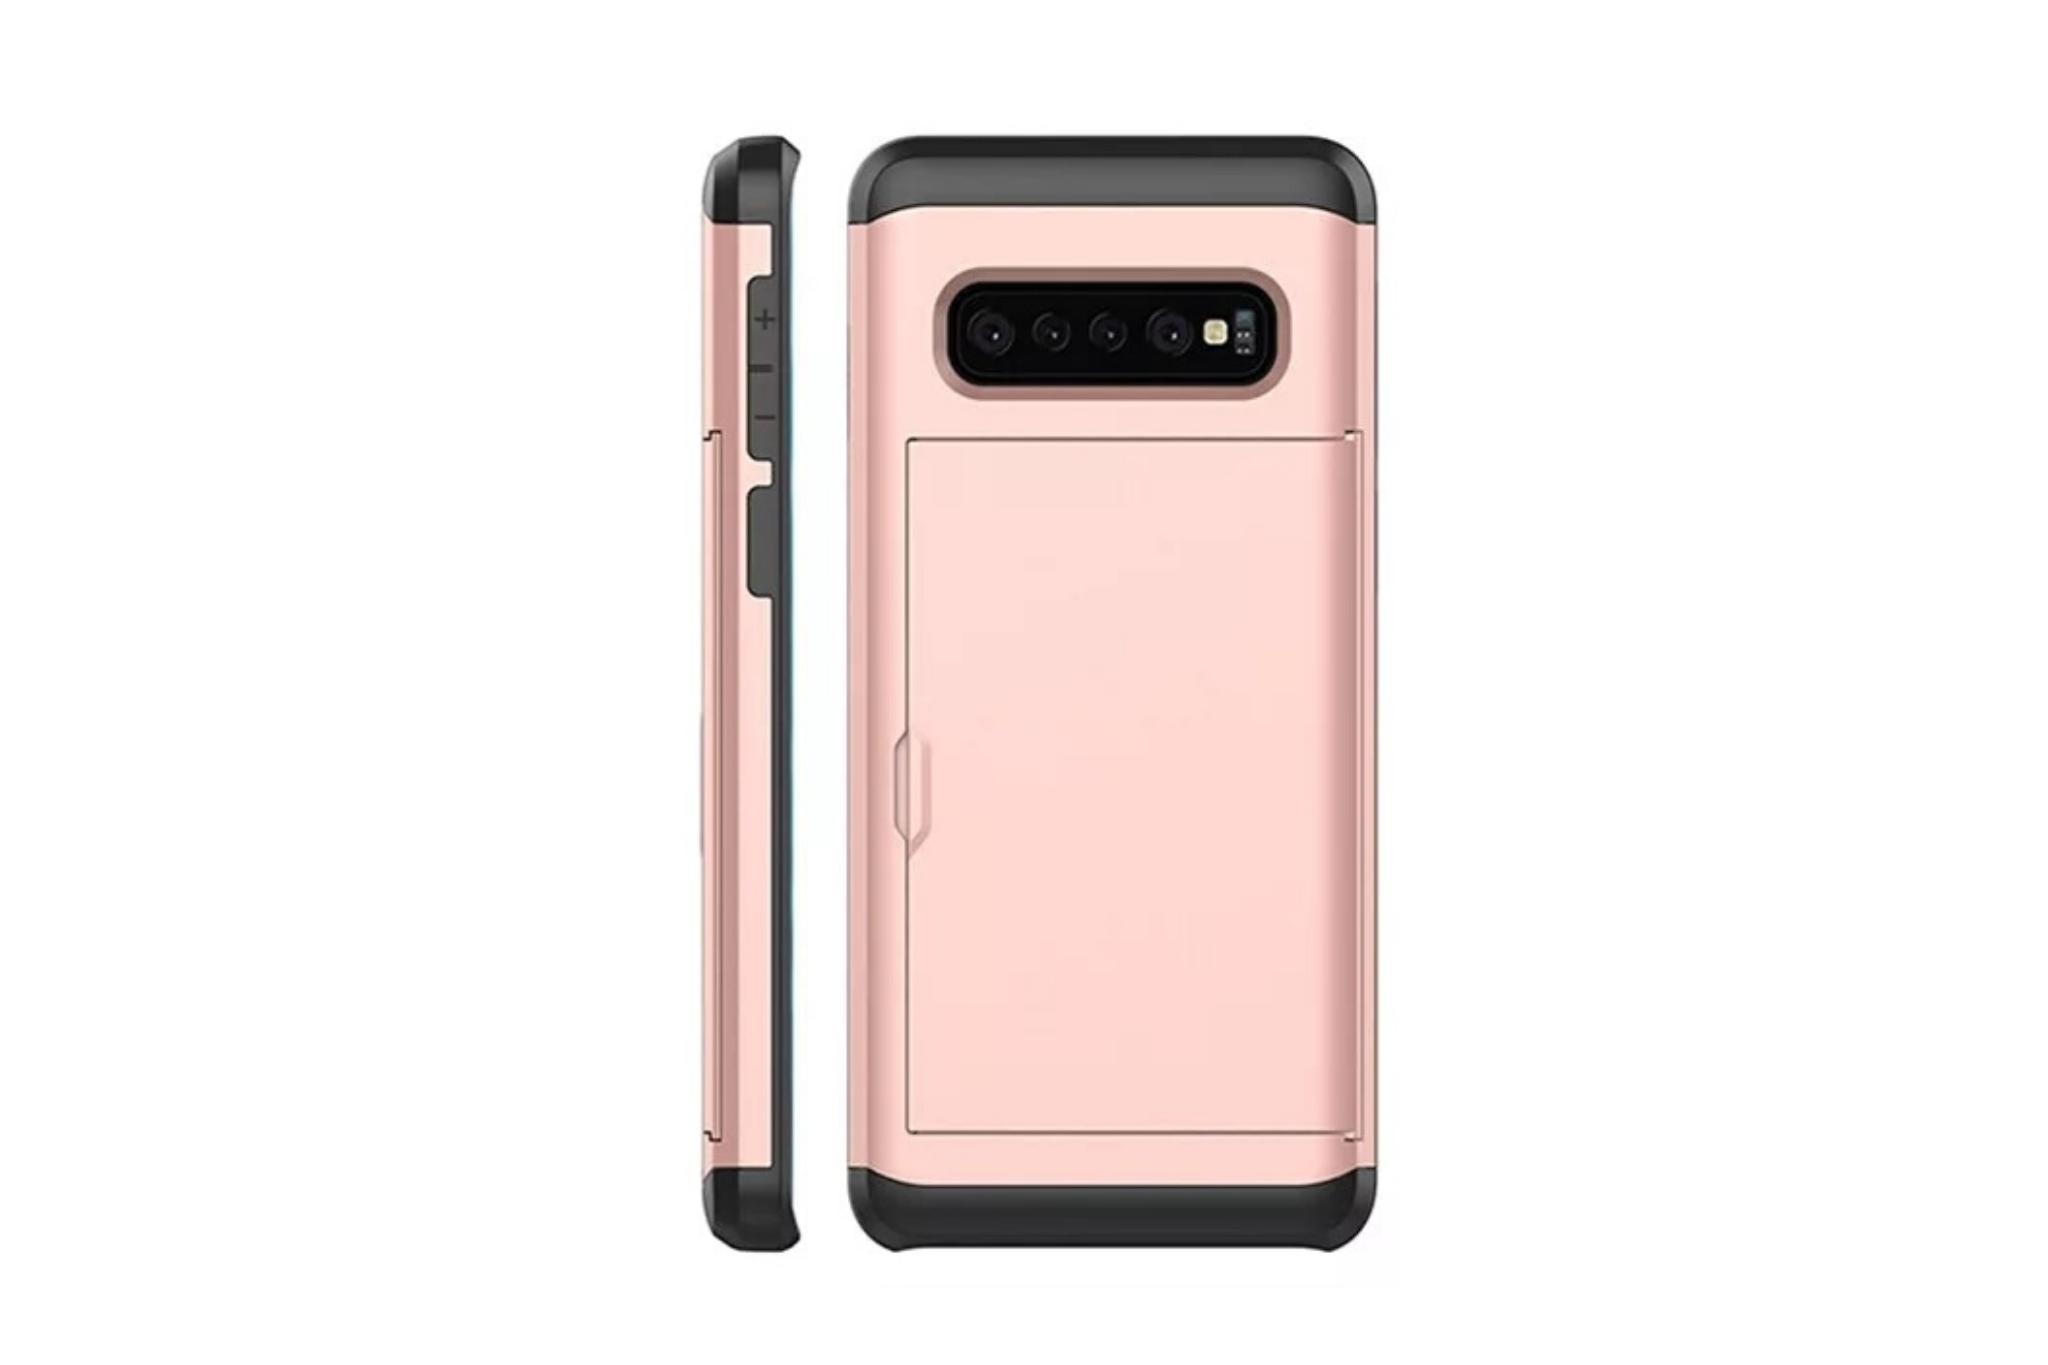 Smartphonehoesje Samsung S20 FE | Pasjesschuif | Rose gold